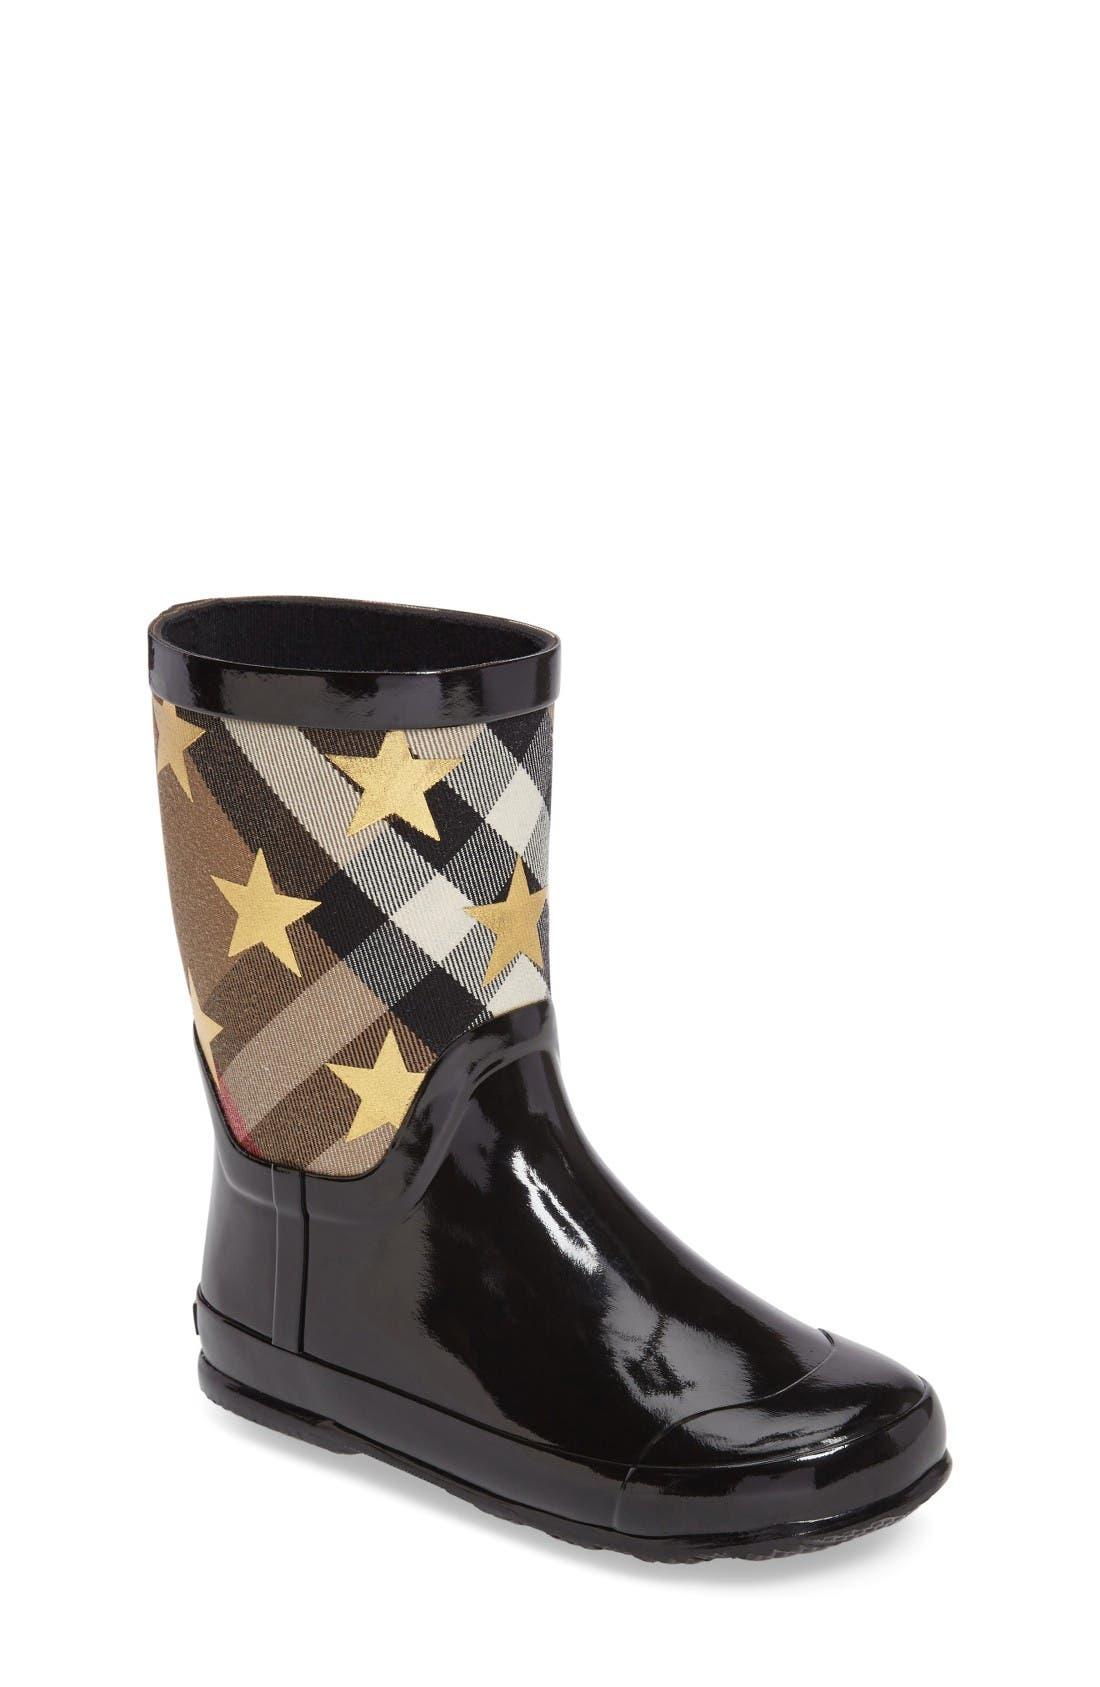 Ranmoor Star Rain Boot,                         Main,                         color, Black